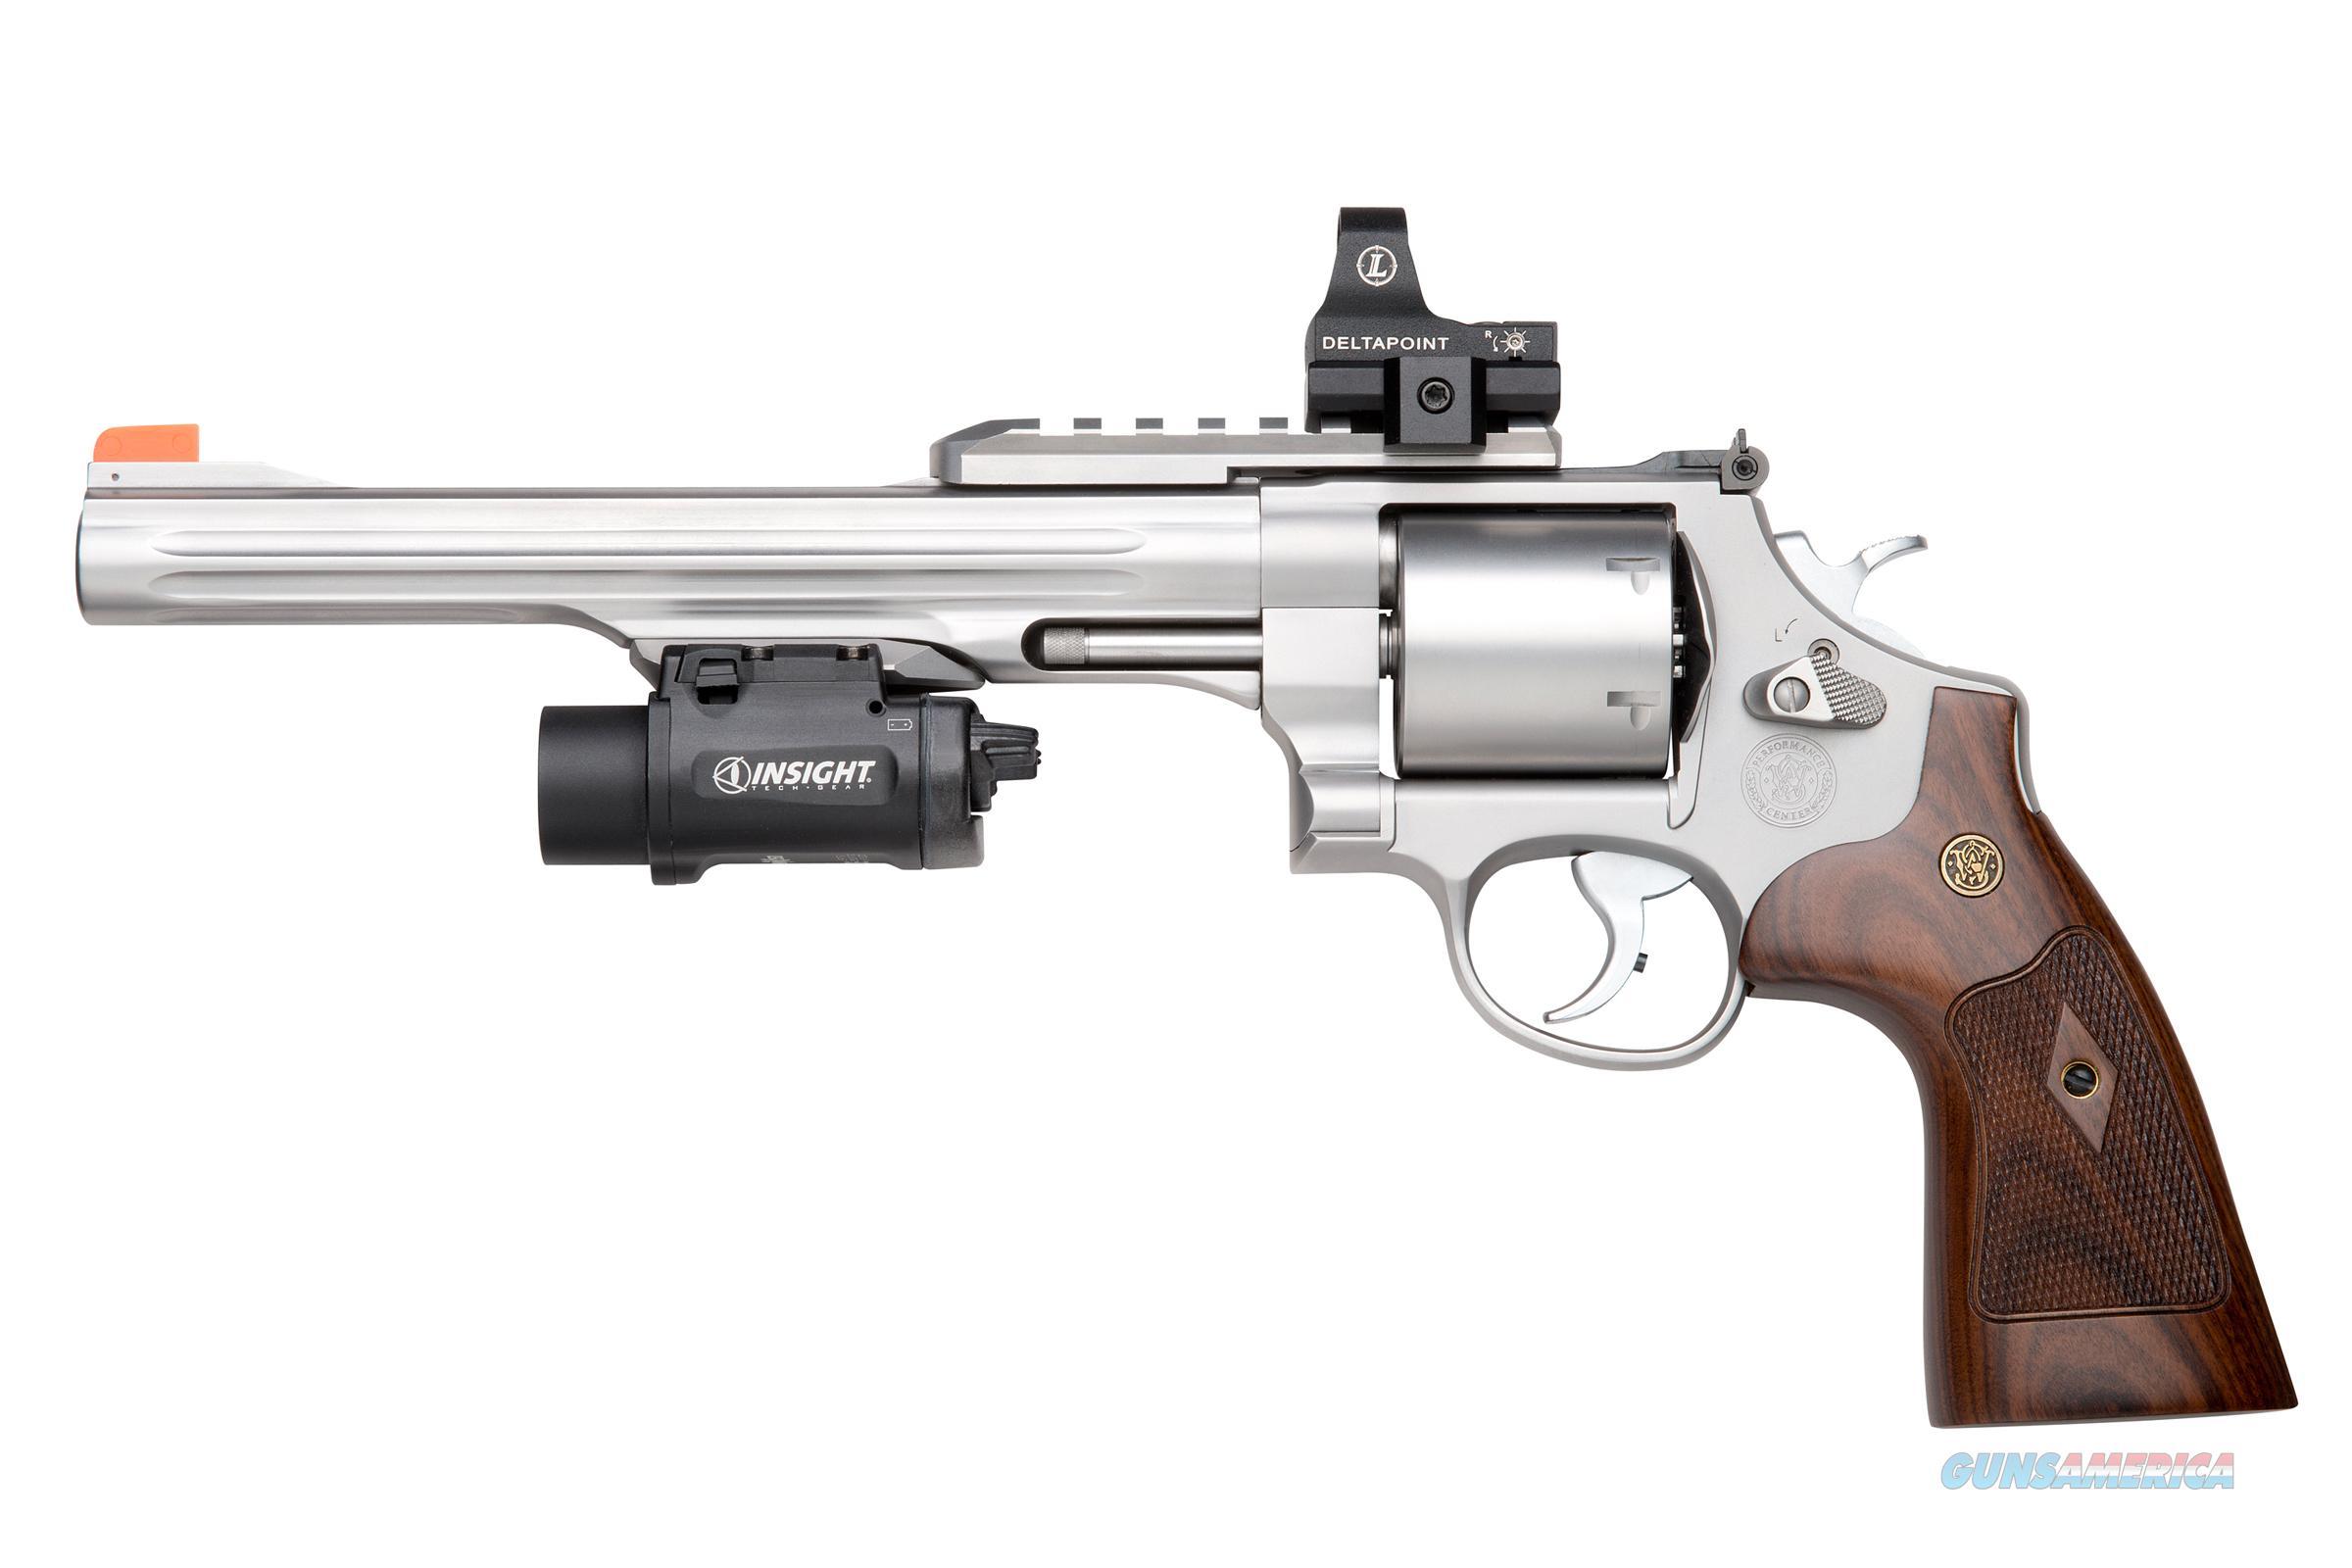 "Smith & Wesson 629 Performance Center .44 Mag 8 3/8"" Fluted Barrel, Picatinny Rails *NEW* SKU 170334  Guns > Pistols > Smith & Wesson Revolvers > Performance Center"